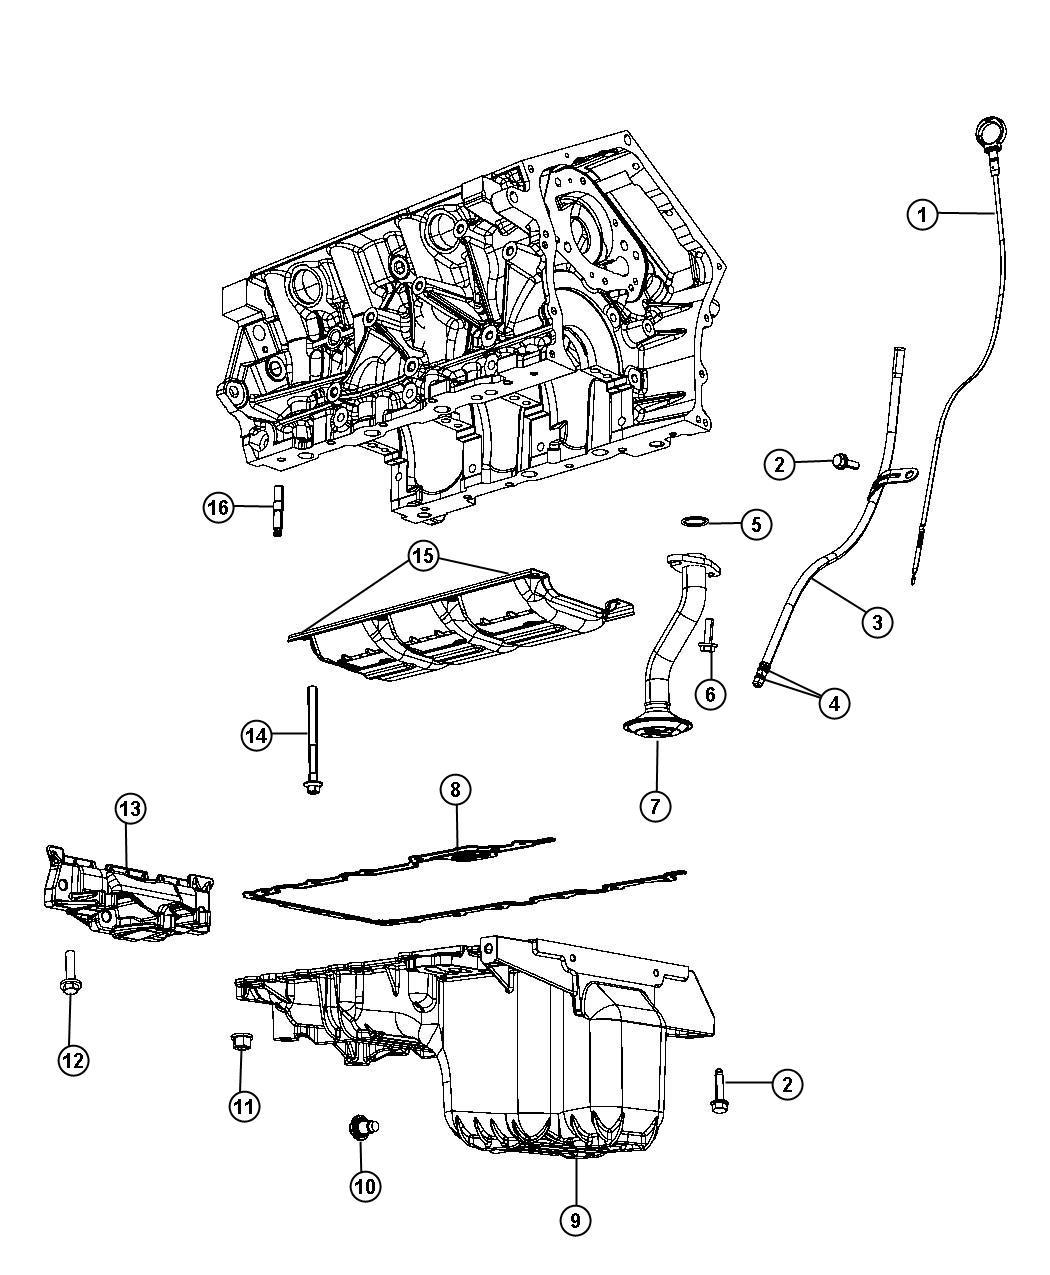 Chrysler 300 Pan Oil Includes Engine Oil Drain Plug